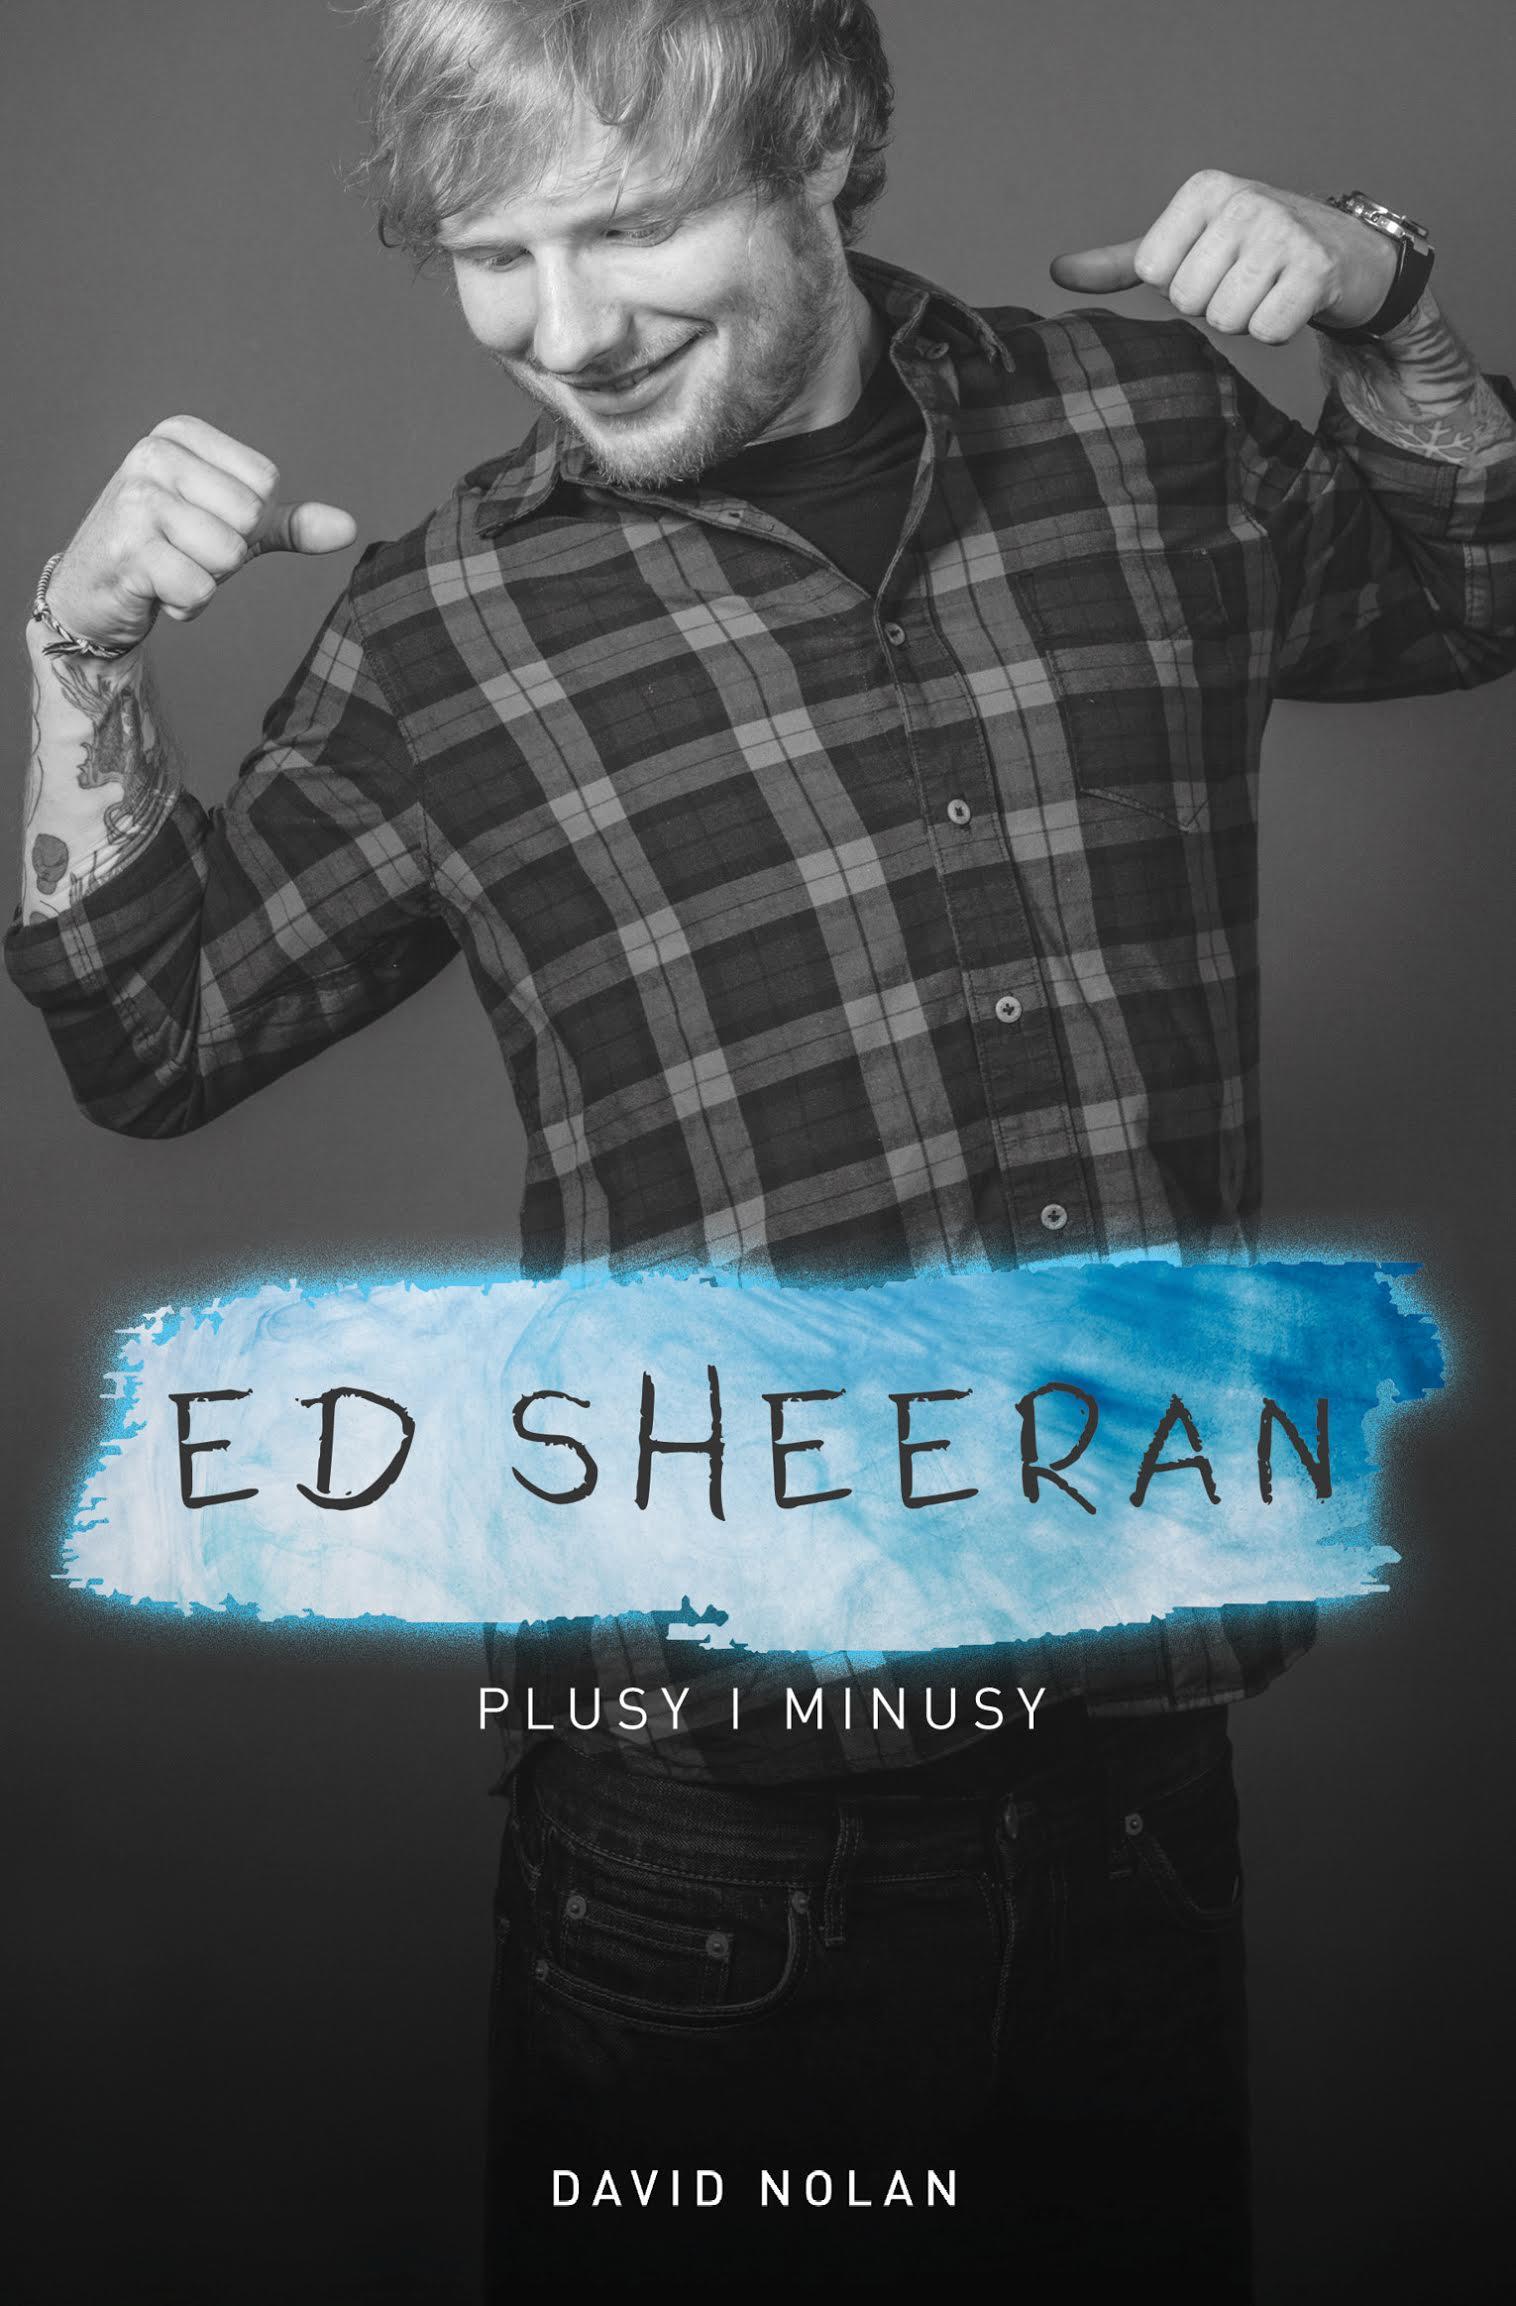 David Nolan-Ed Sheeran. Plusy i minusy